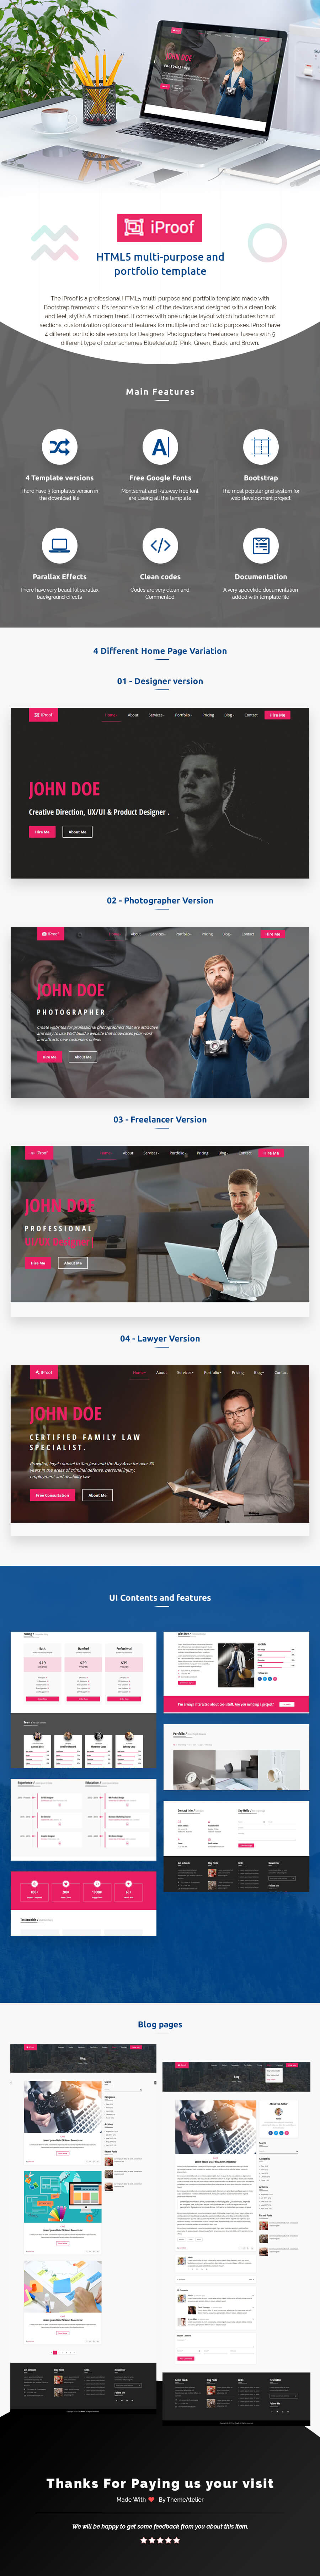 iProof - Multipurpose HTML Template - themeforest, site-templates, creative